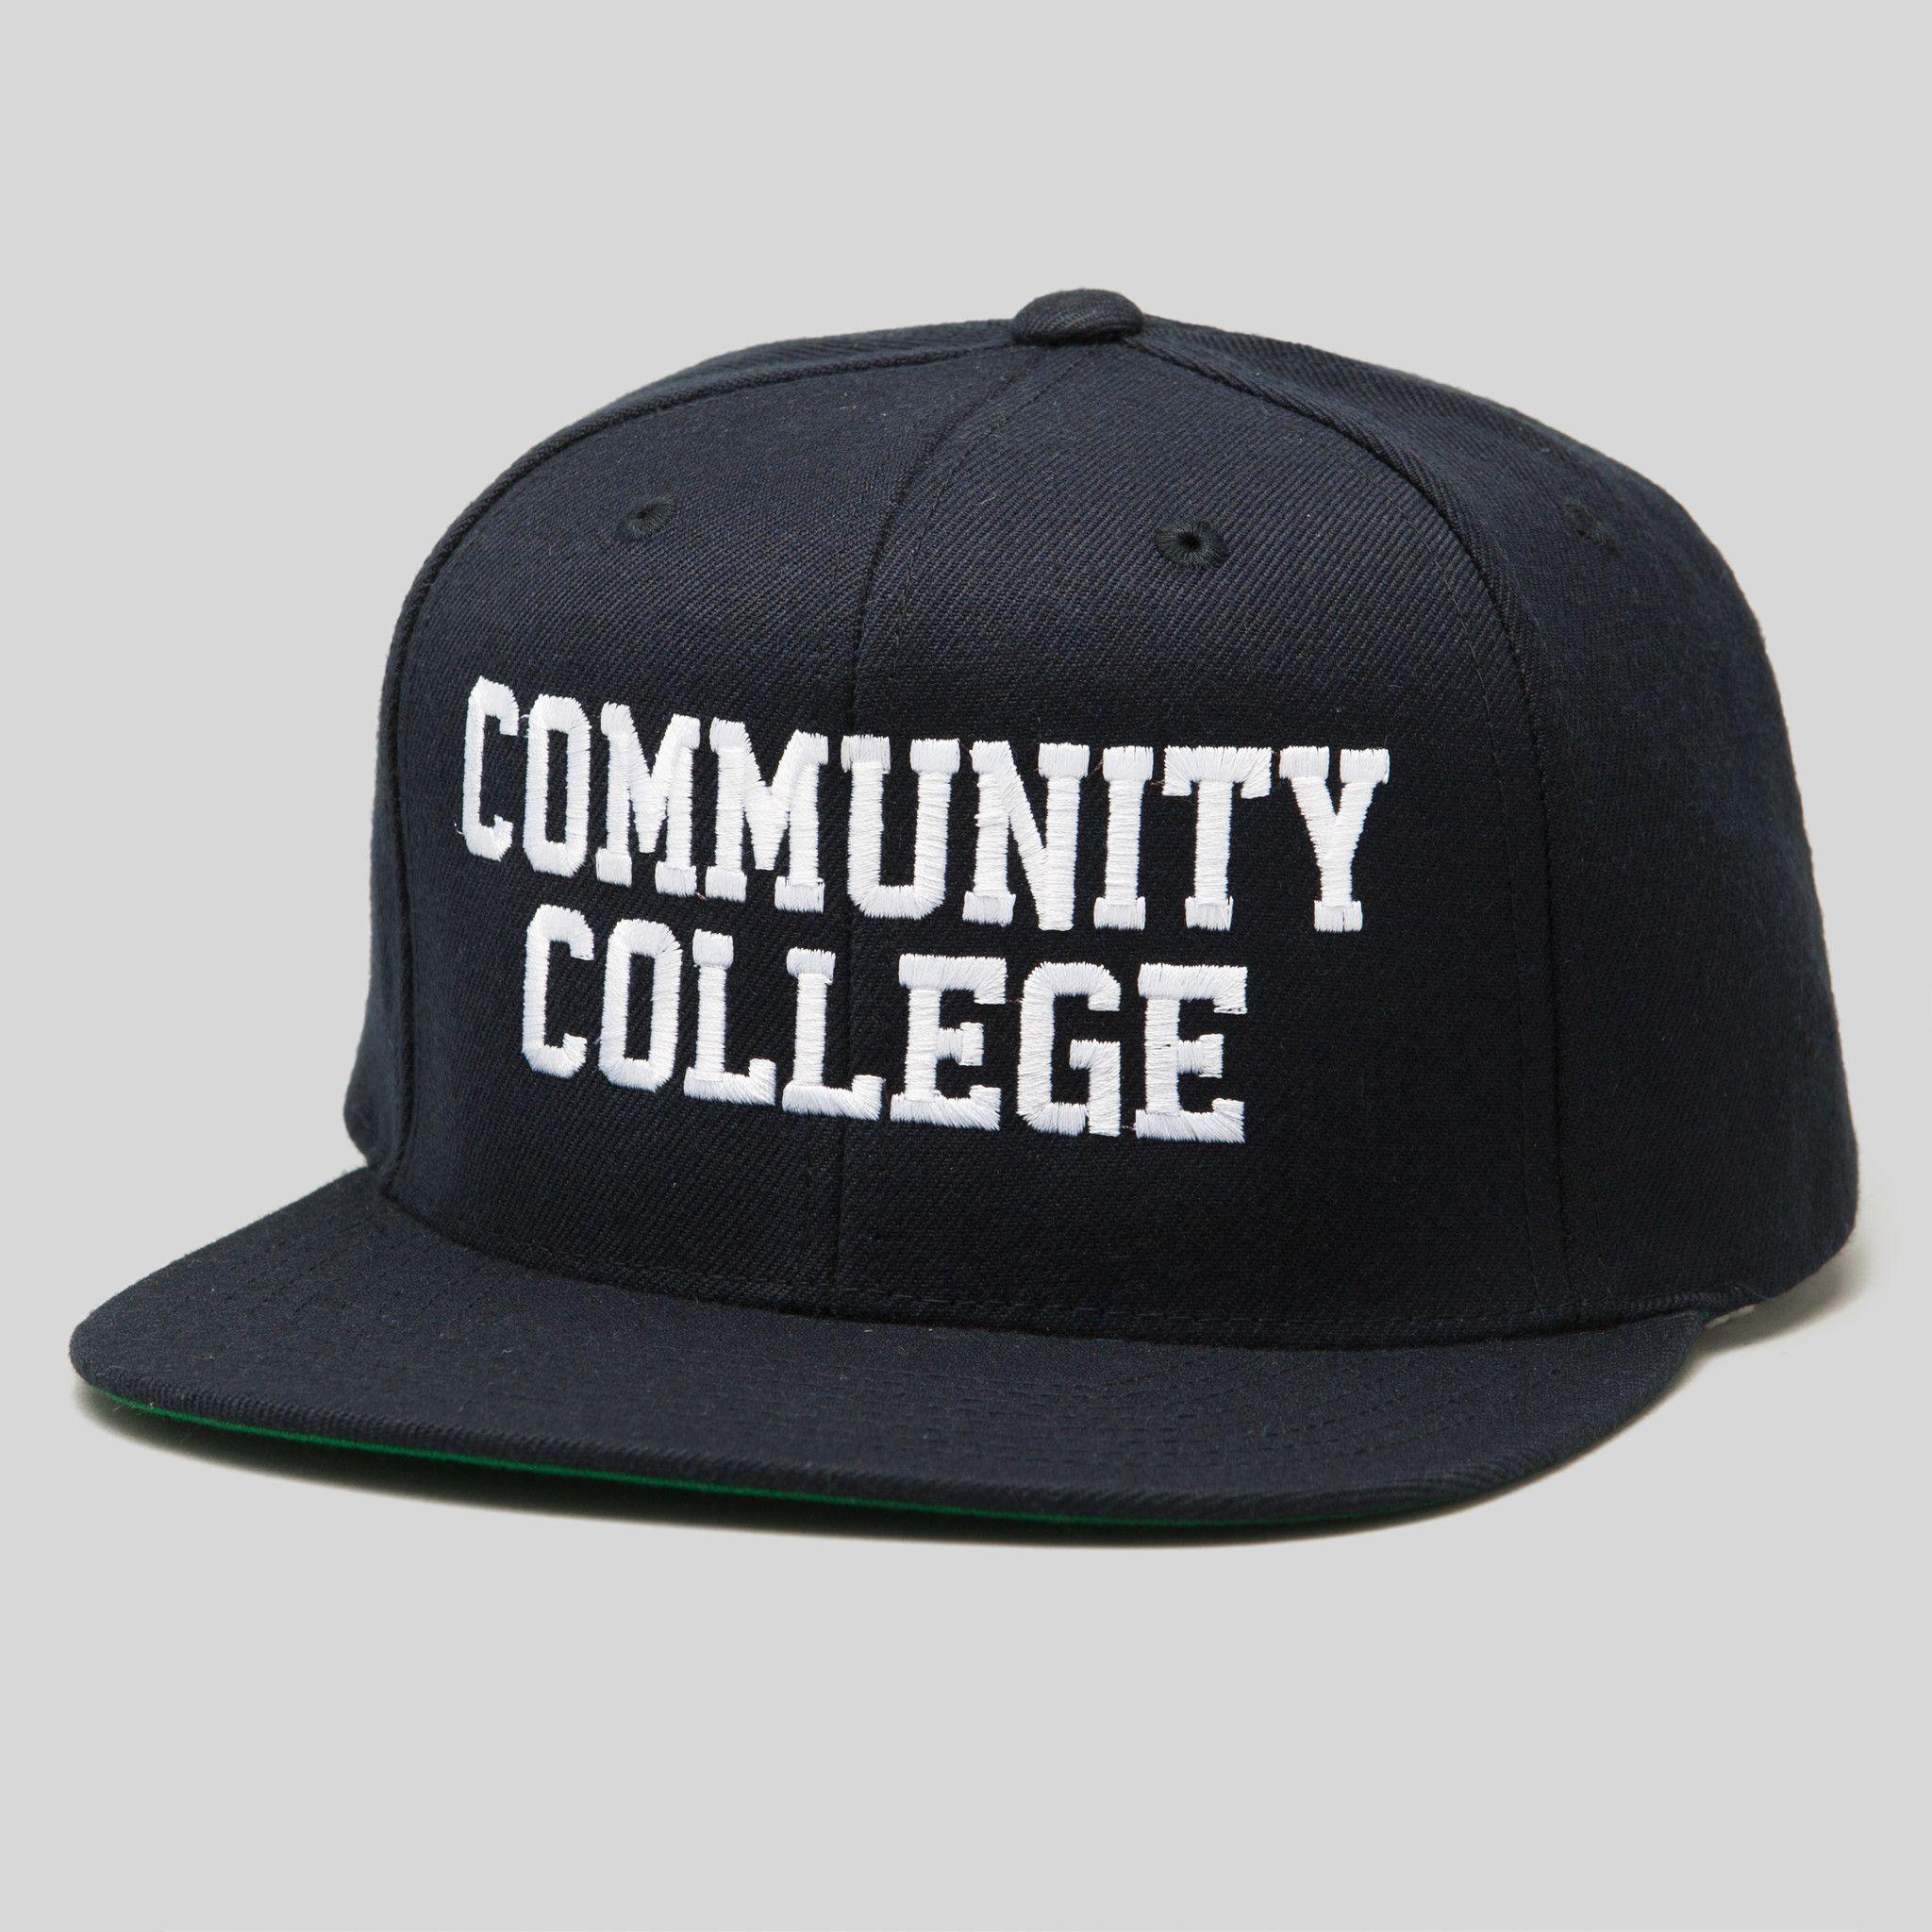 2f3e4c0459a Community College Snapback Cap